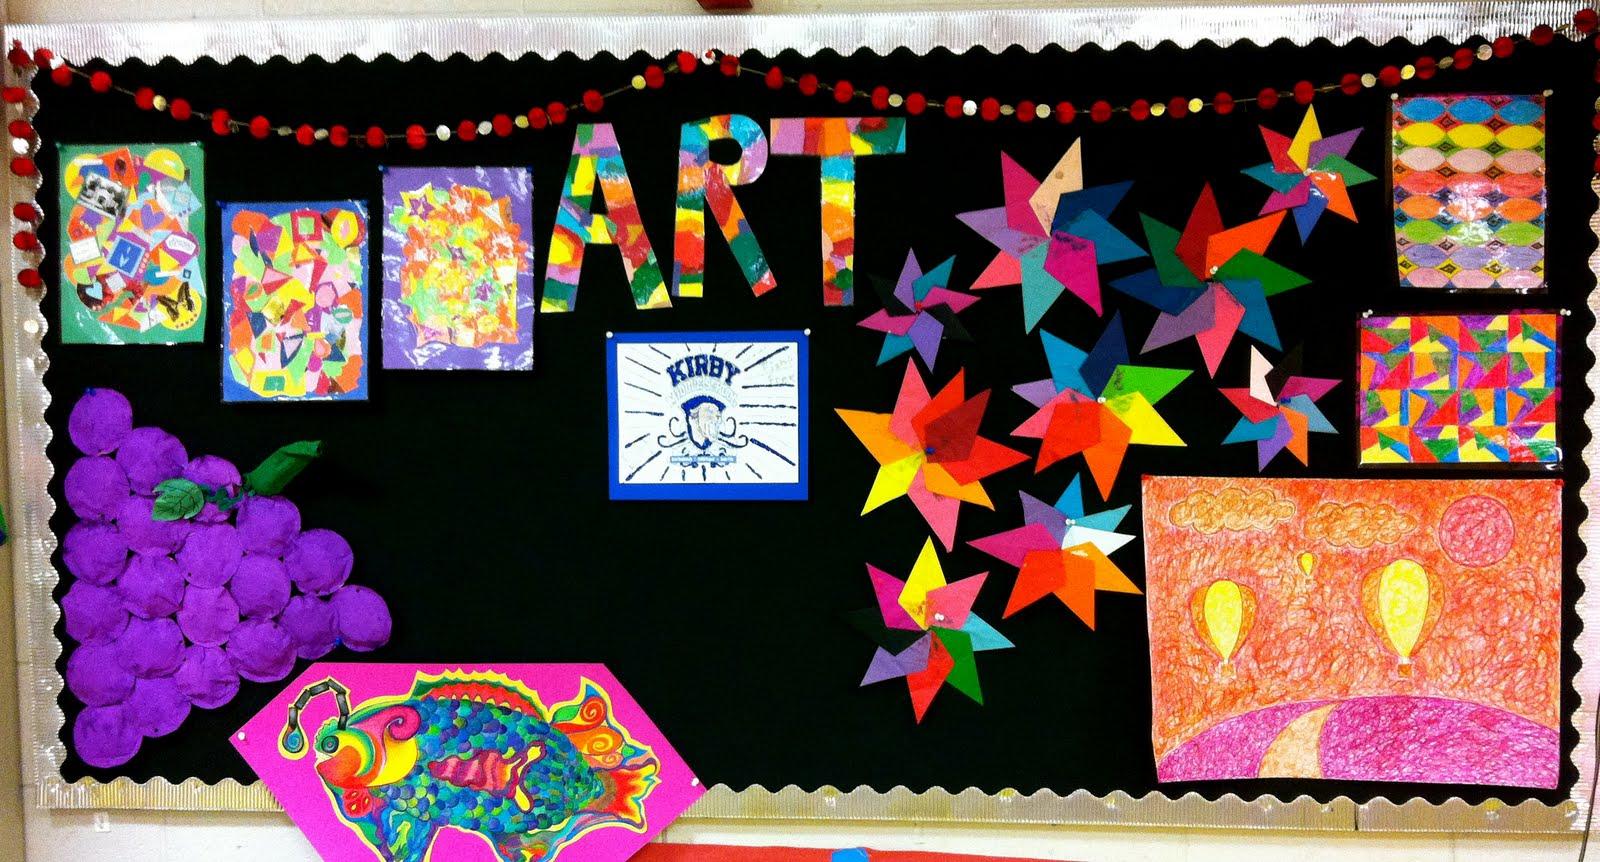 Kirby Middle Visual Art Classroom Displays